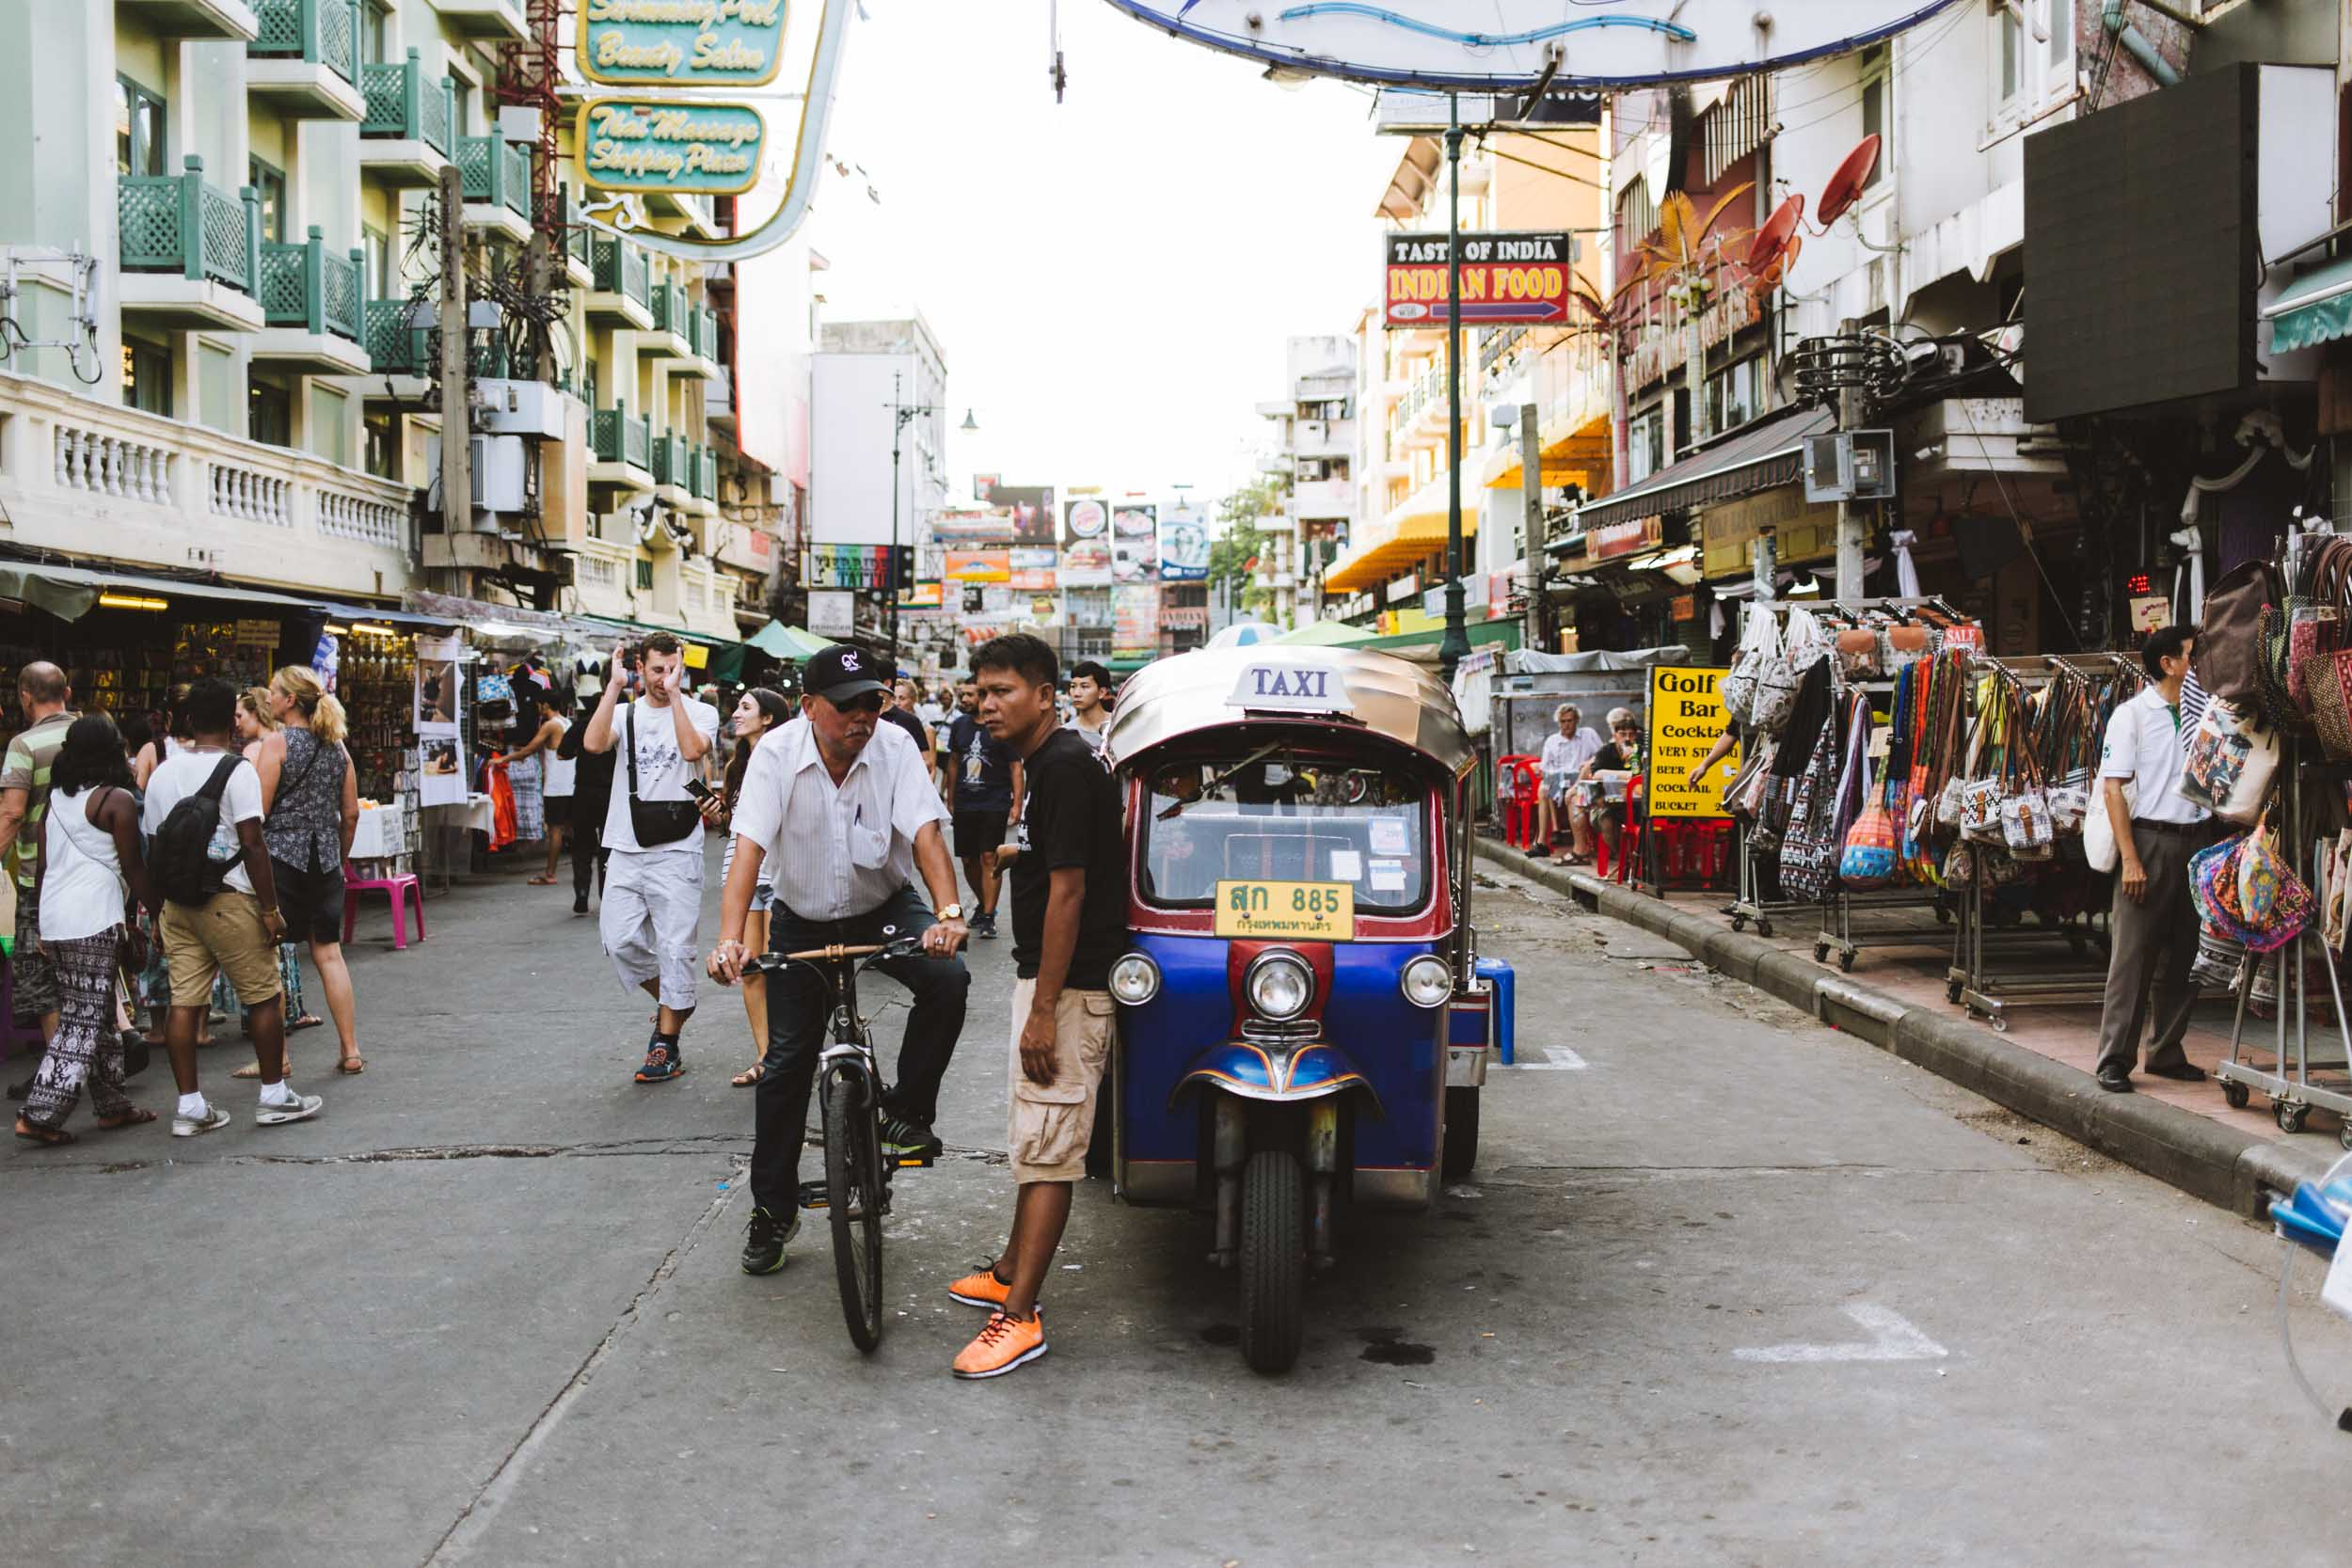 thailand_budget_travel_013.jpg